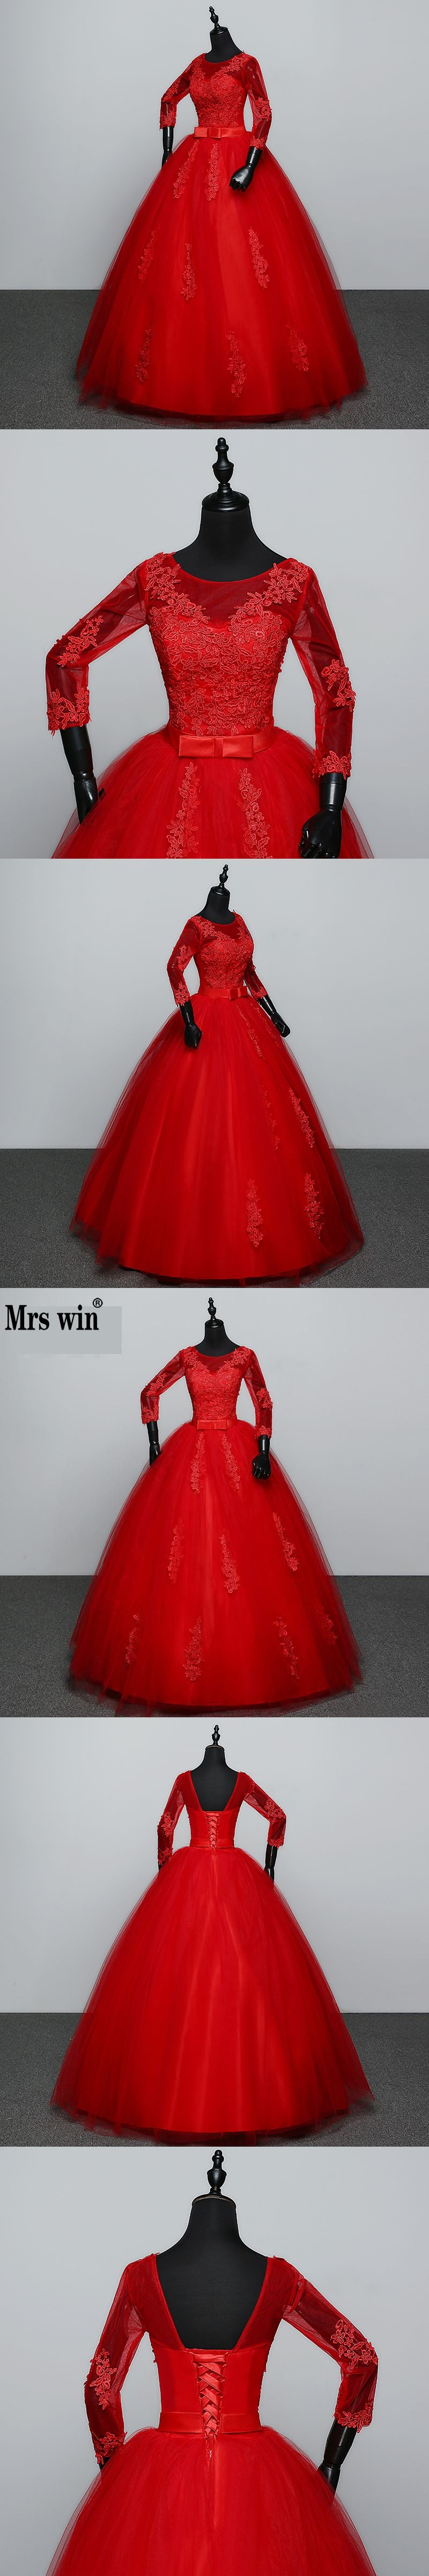 new arrival customized white red wedding dress quarter sleeve